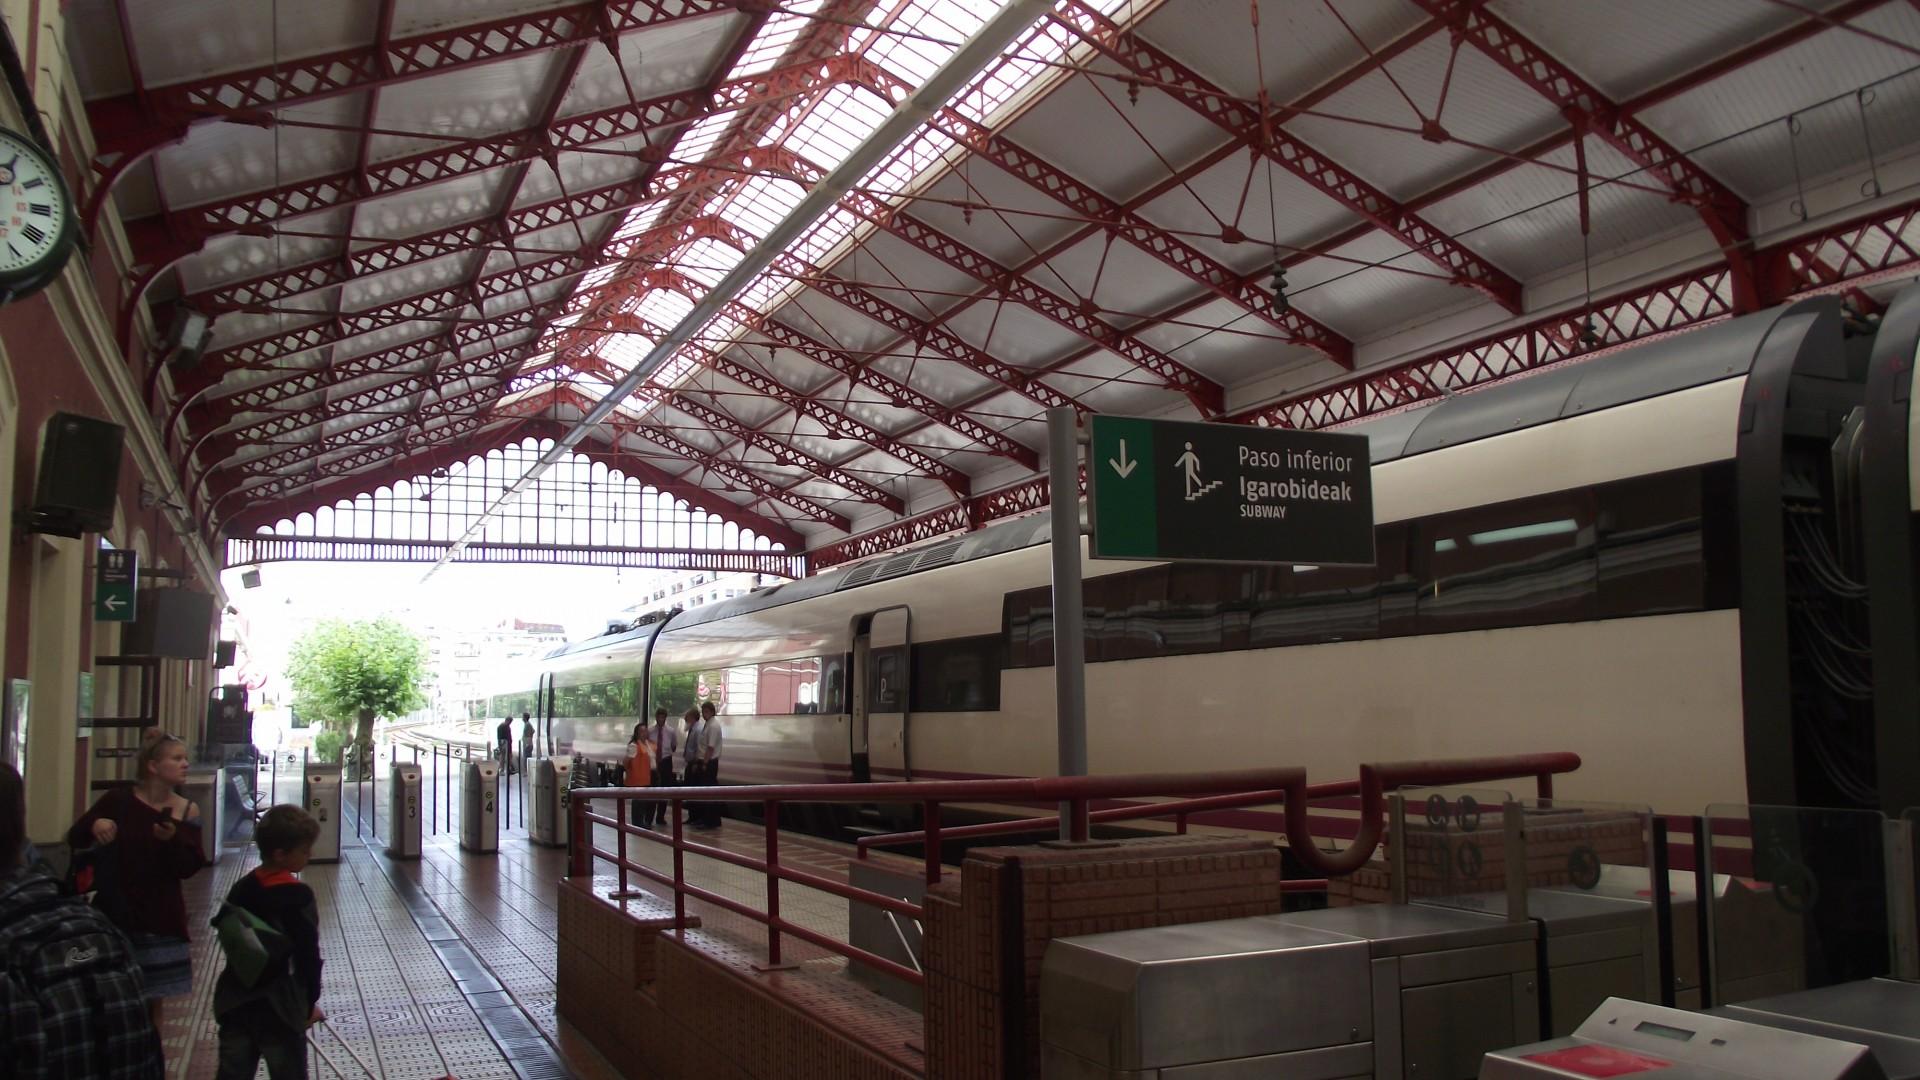 Alvia serie 120 en la estación de San Sebastián. Foto: Smiley.toerist.